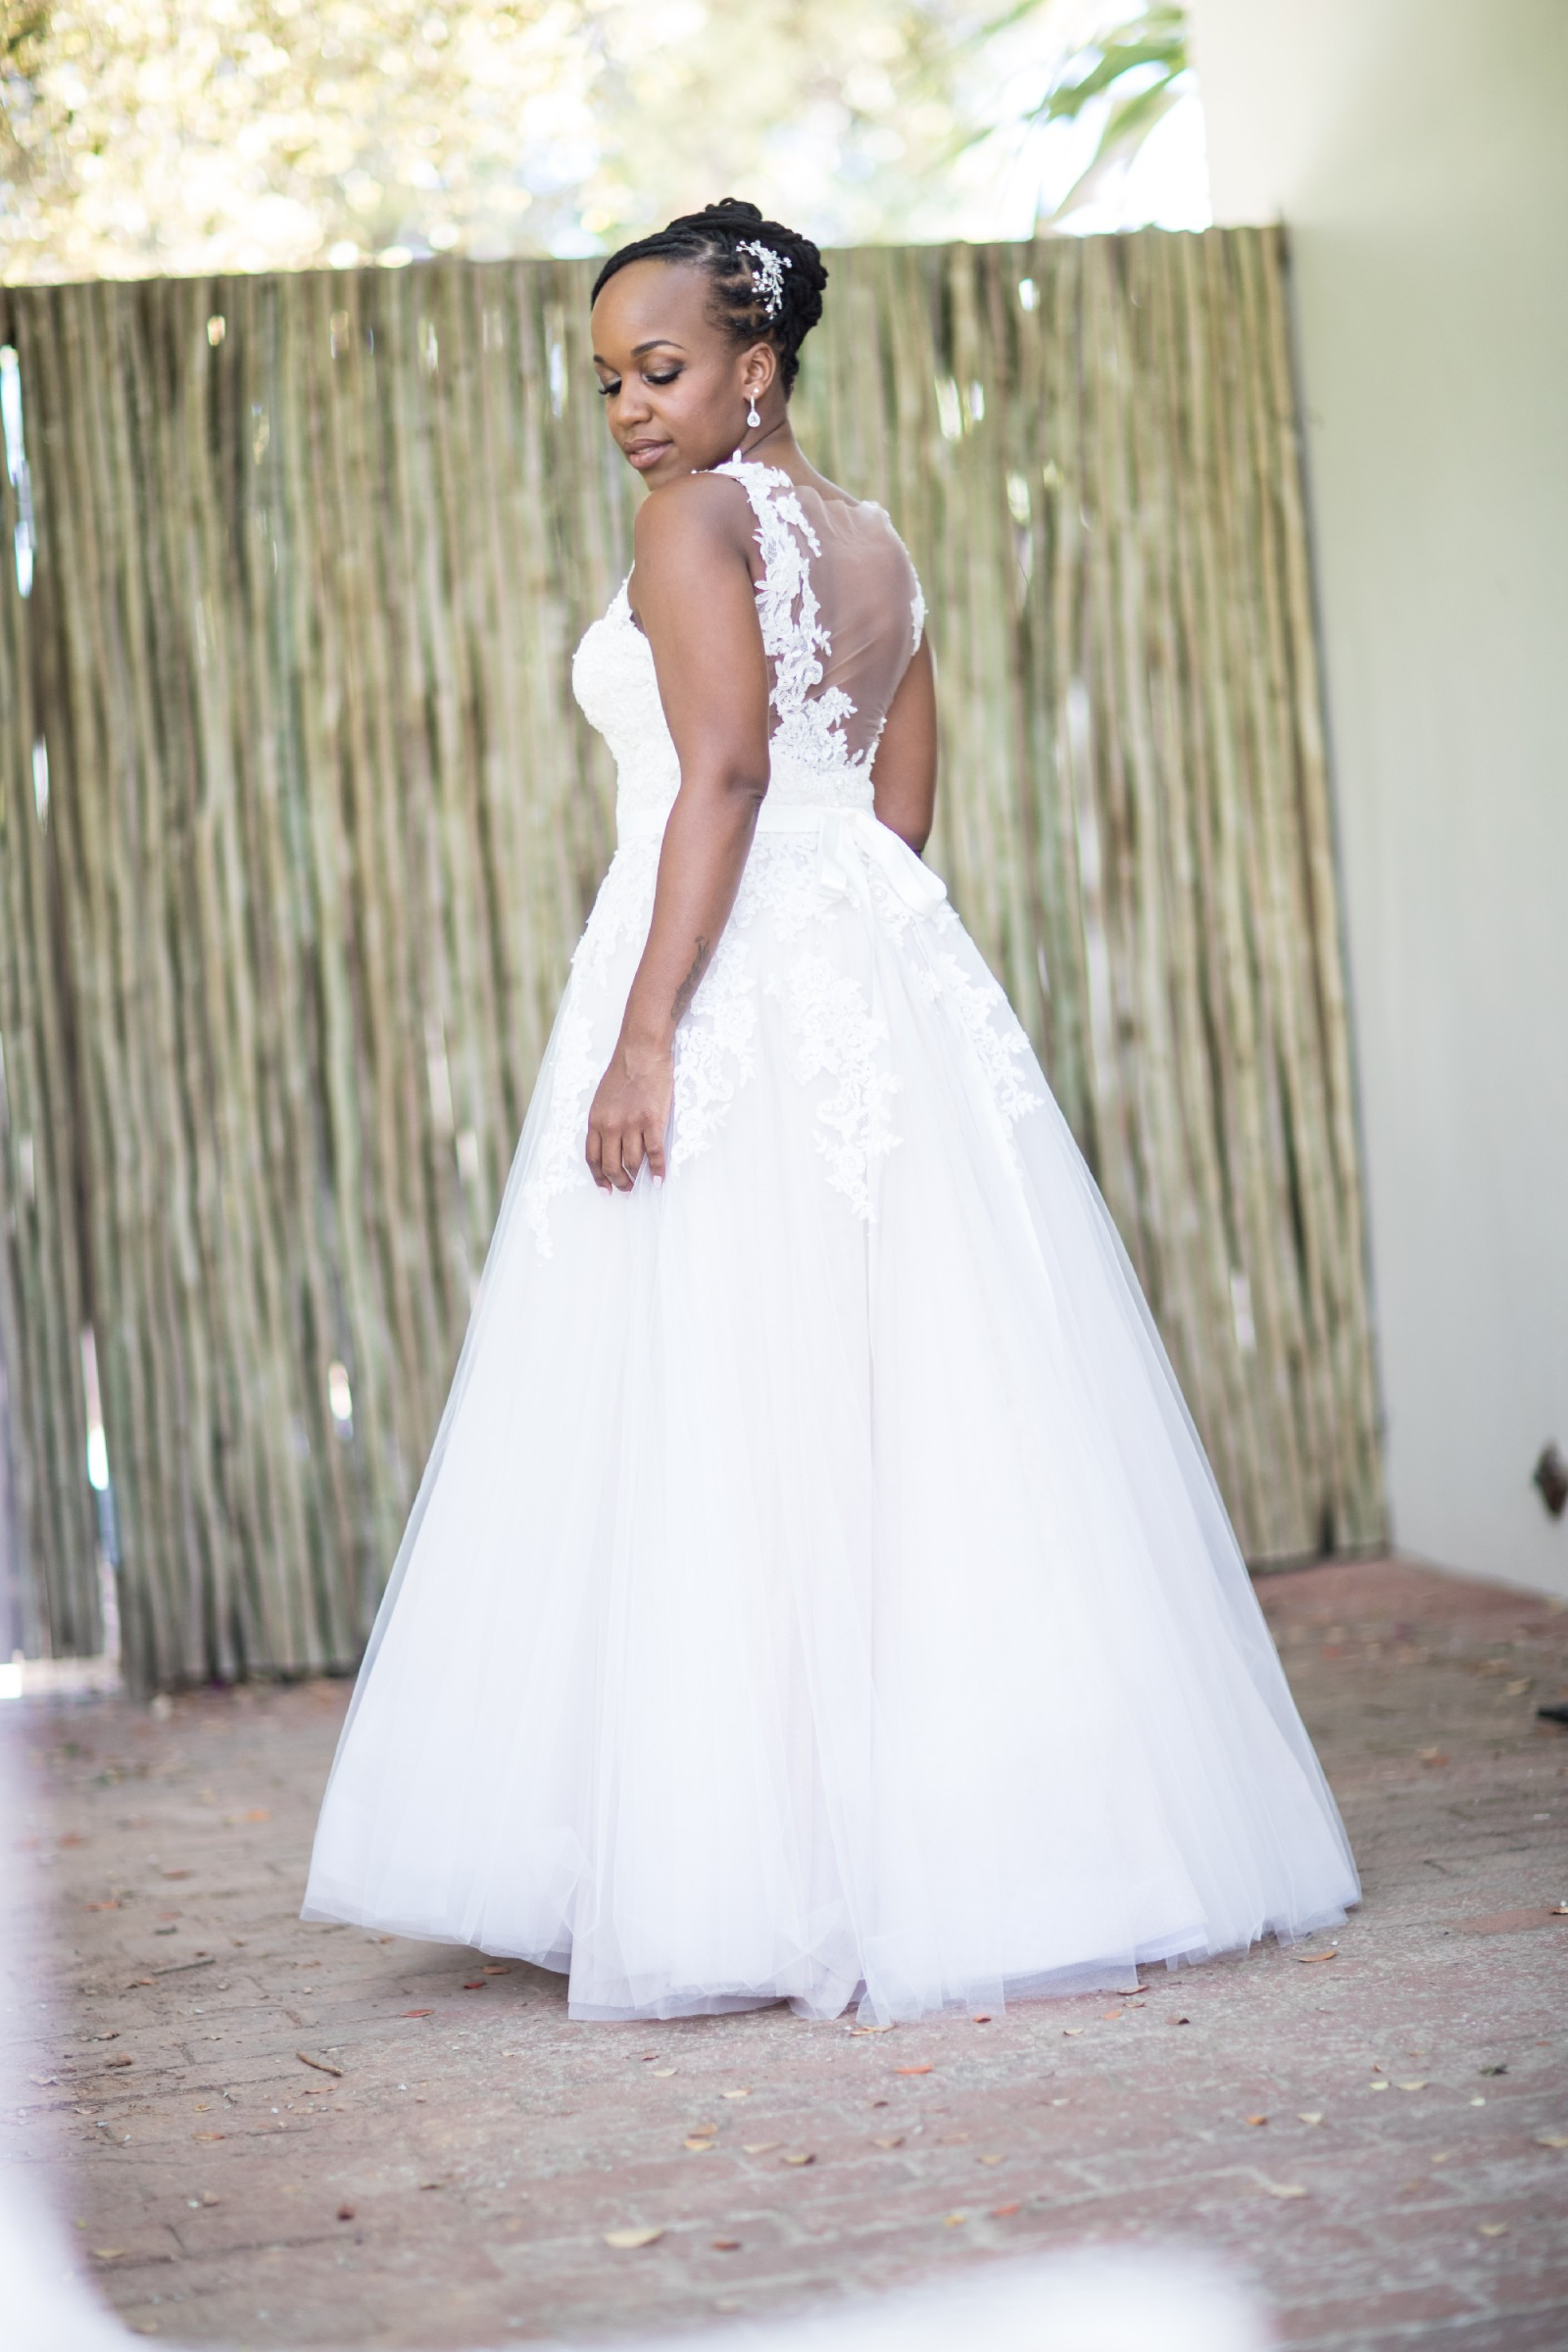 94628d41de6 Anel Botha Custom Made Second Hand Wedding Dress on Sale 65% Off -  Stillwhite South Africa